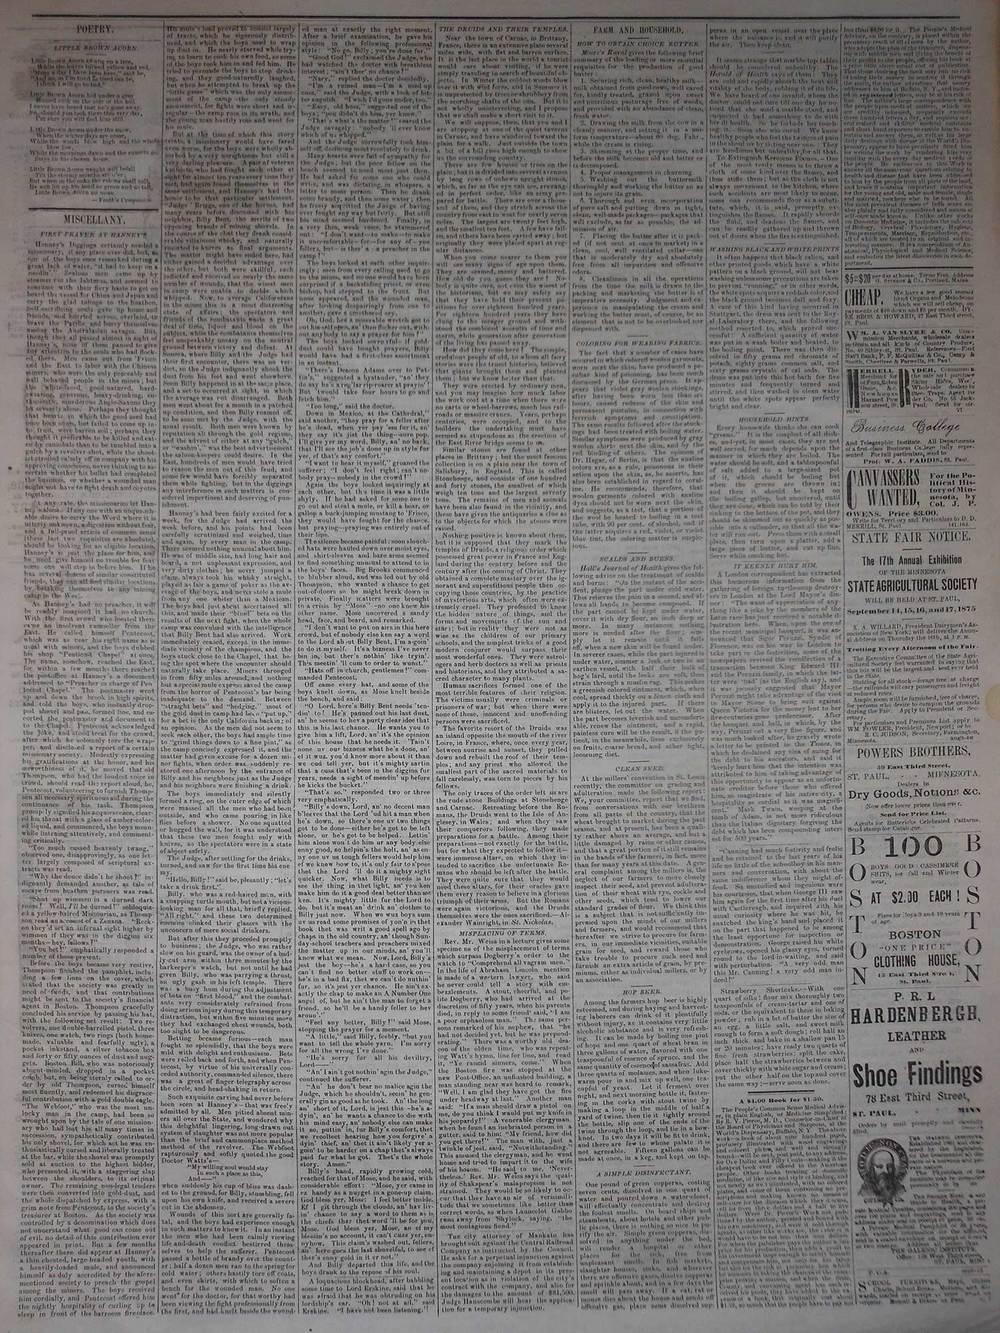 9/8/1875, p3